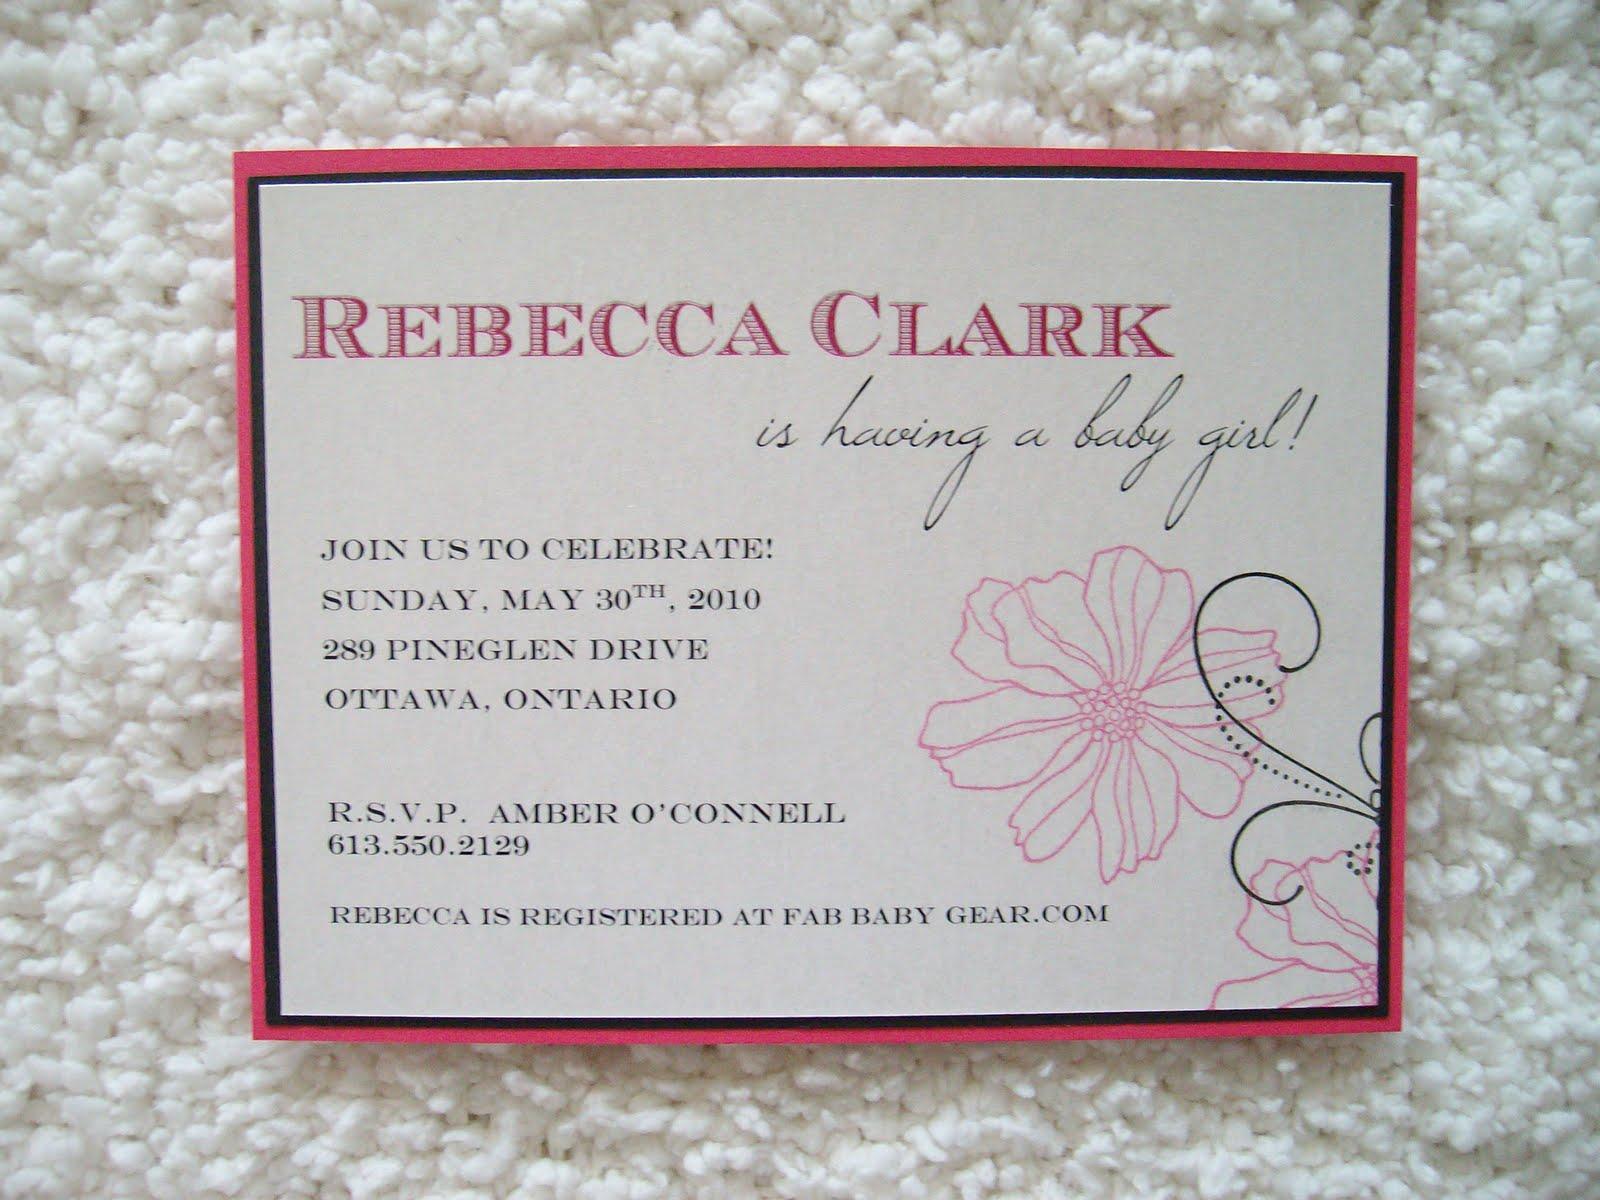 Modern Indian Wedding Invitations Uk: Different Wedding Invitations Blog: Orthodox Jewish